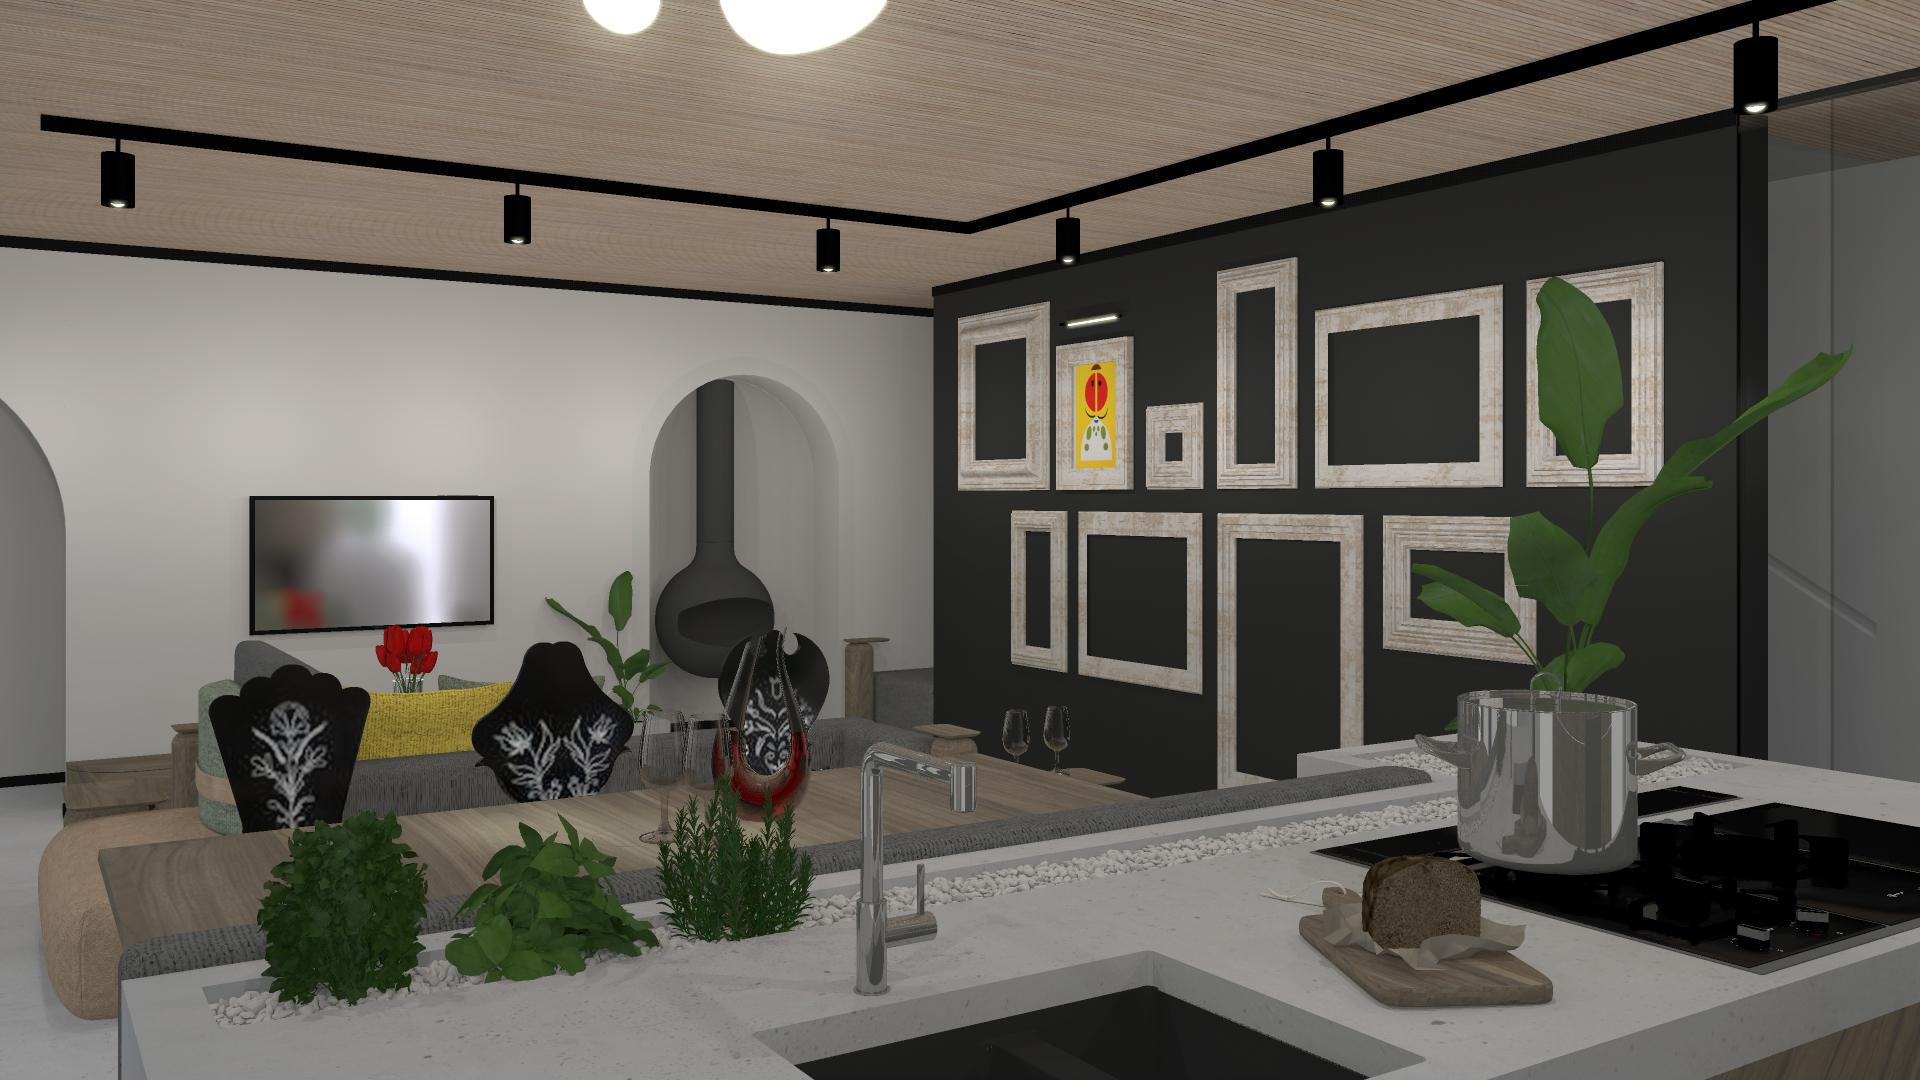 ÉnTér design nappali